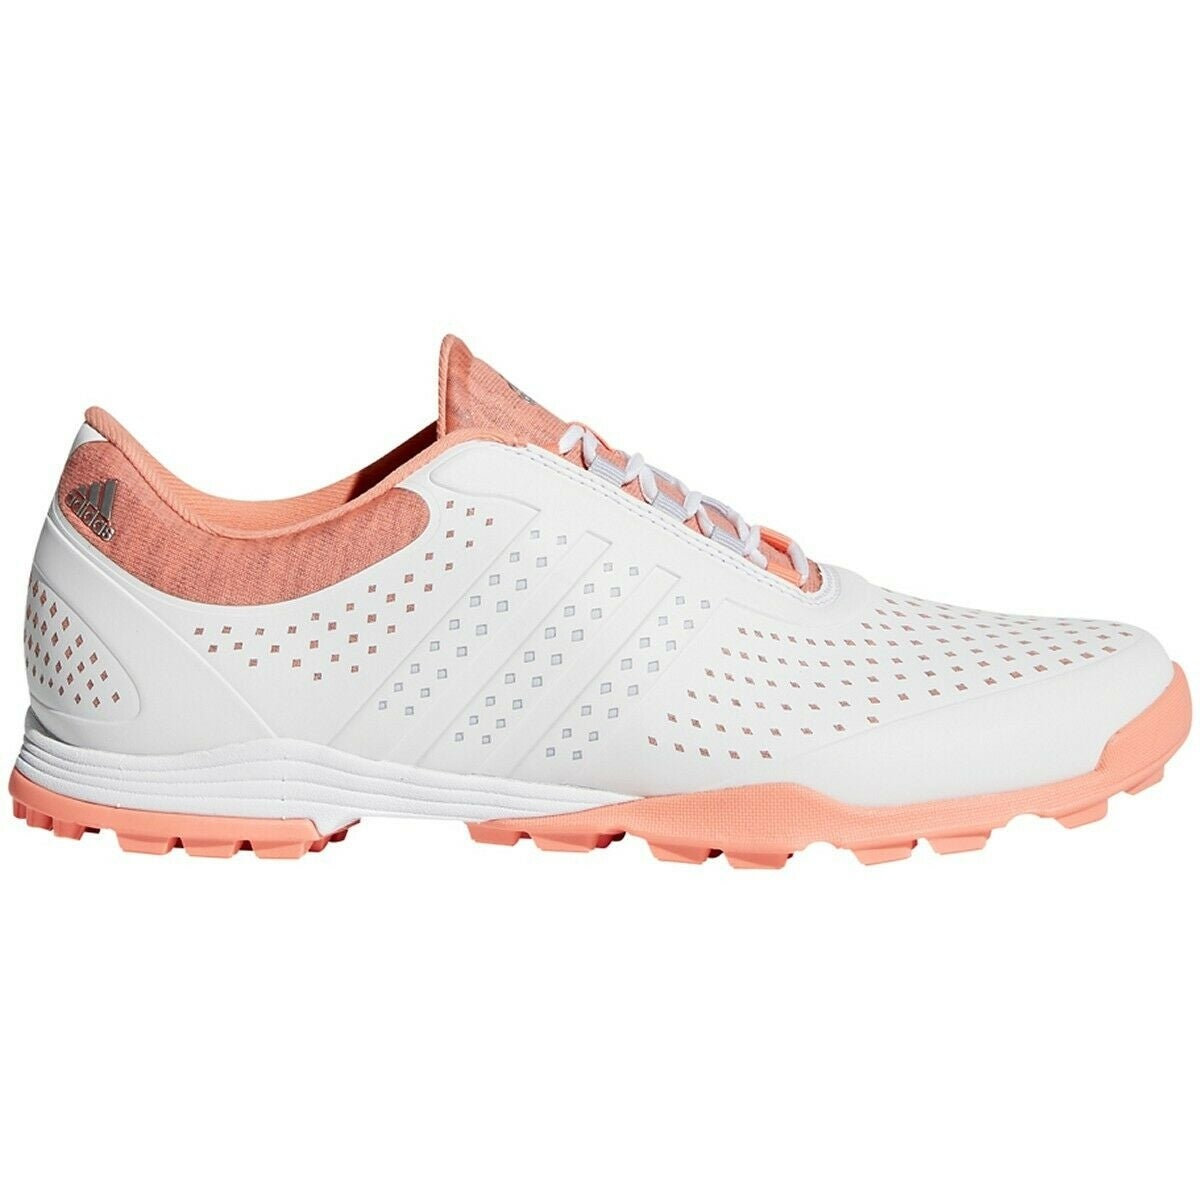 New Adidas Women's Adipure Sport Golf Shoes White/Aero Blue/Chalk Coral DA9133